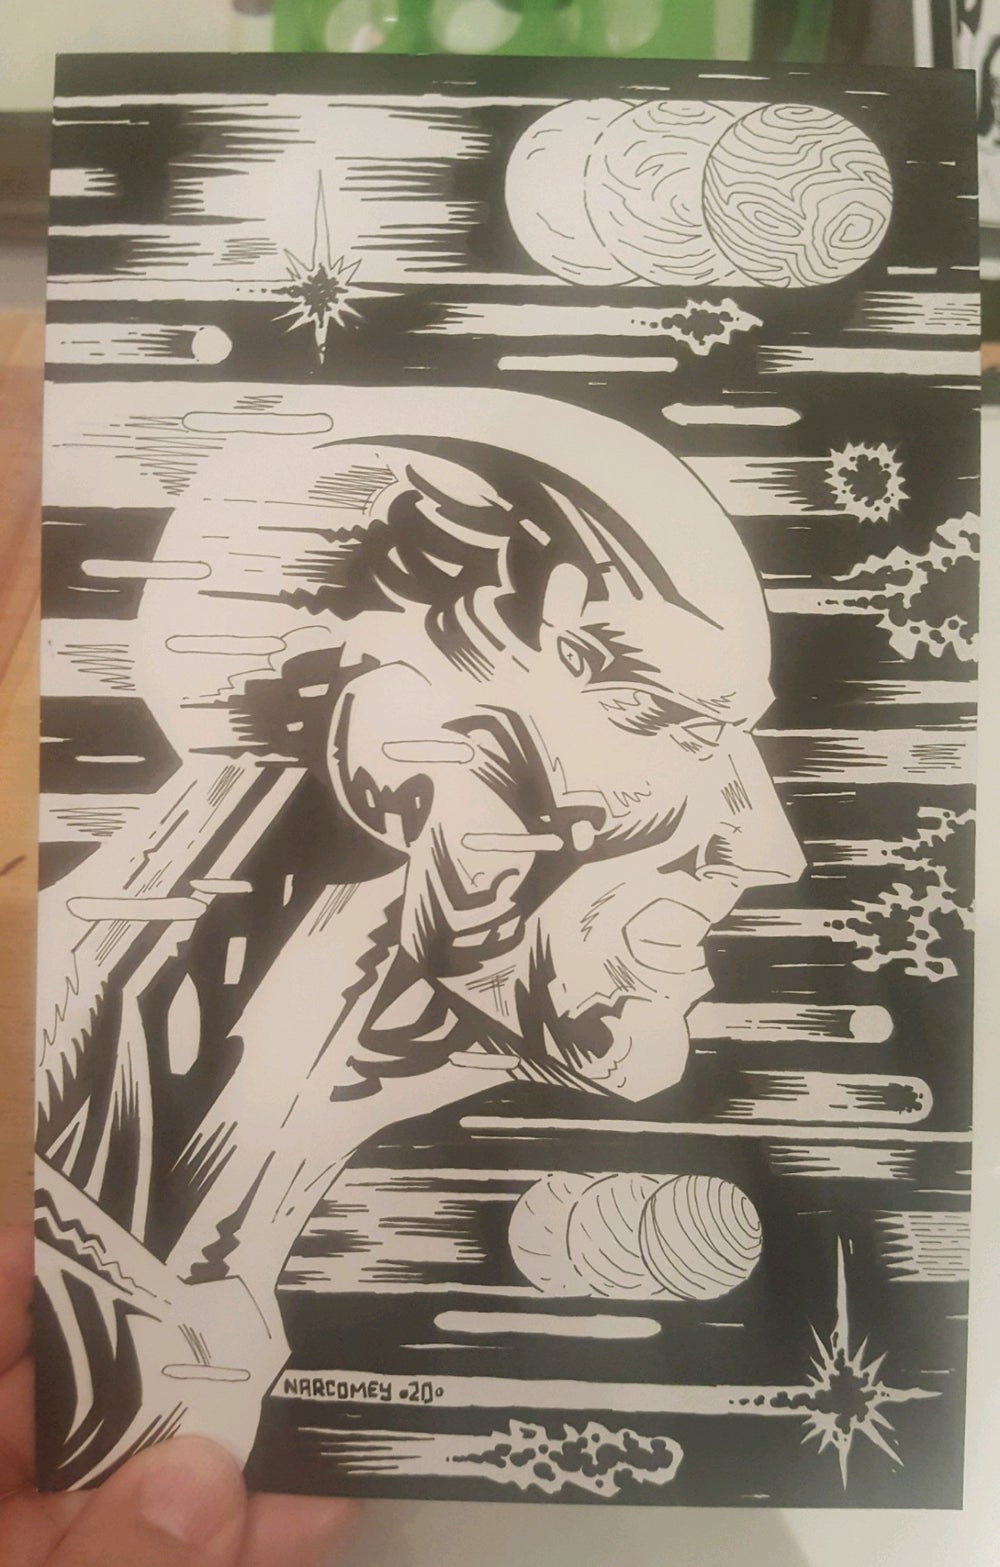 SILVER SURFER original art 5.5x8.5